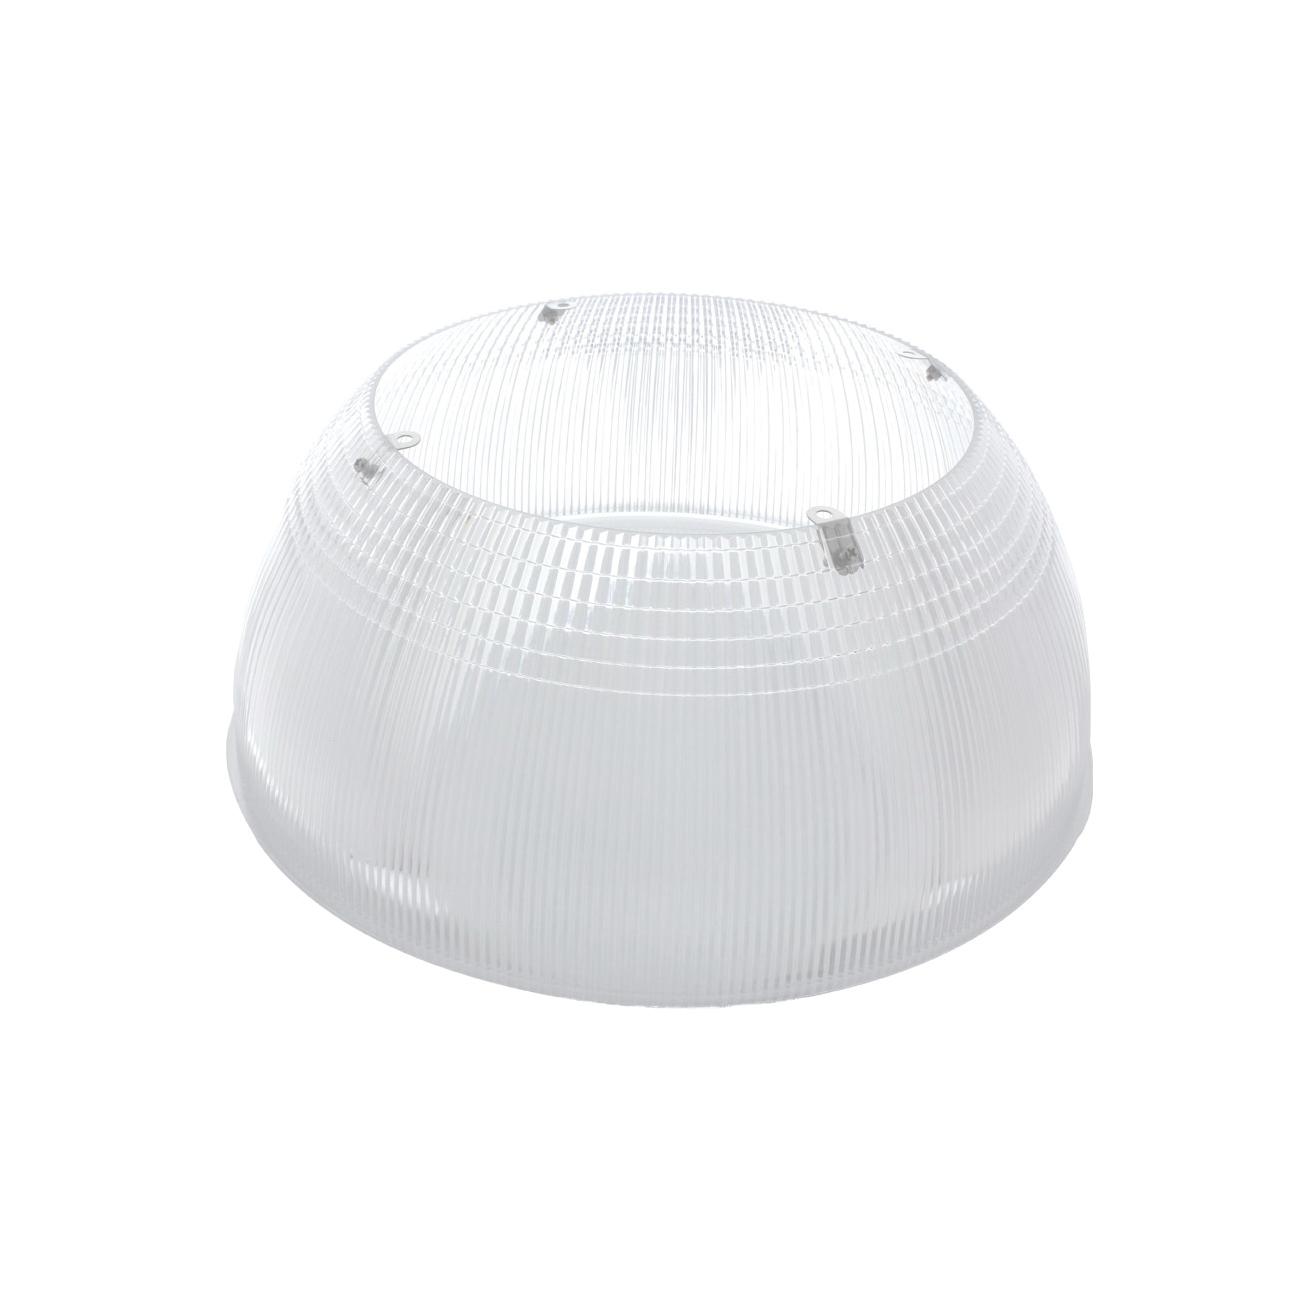 CSC LED HB7B-PC-REF-SM